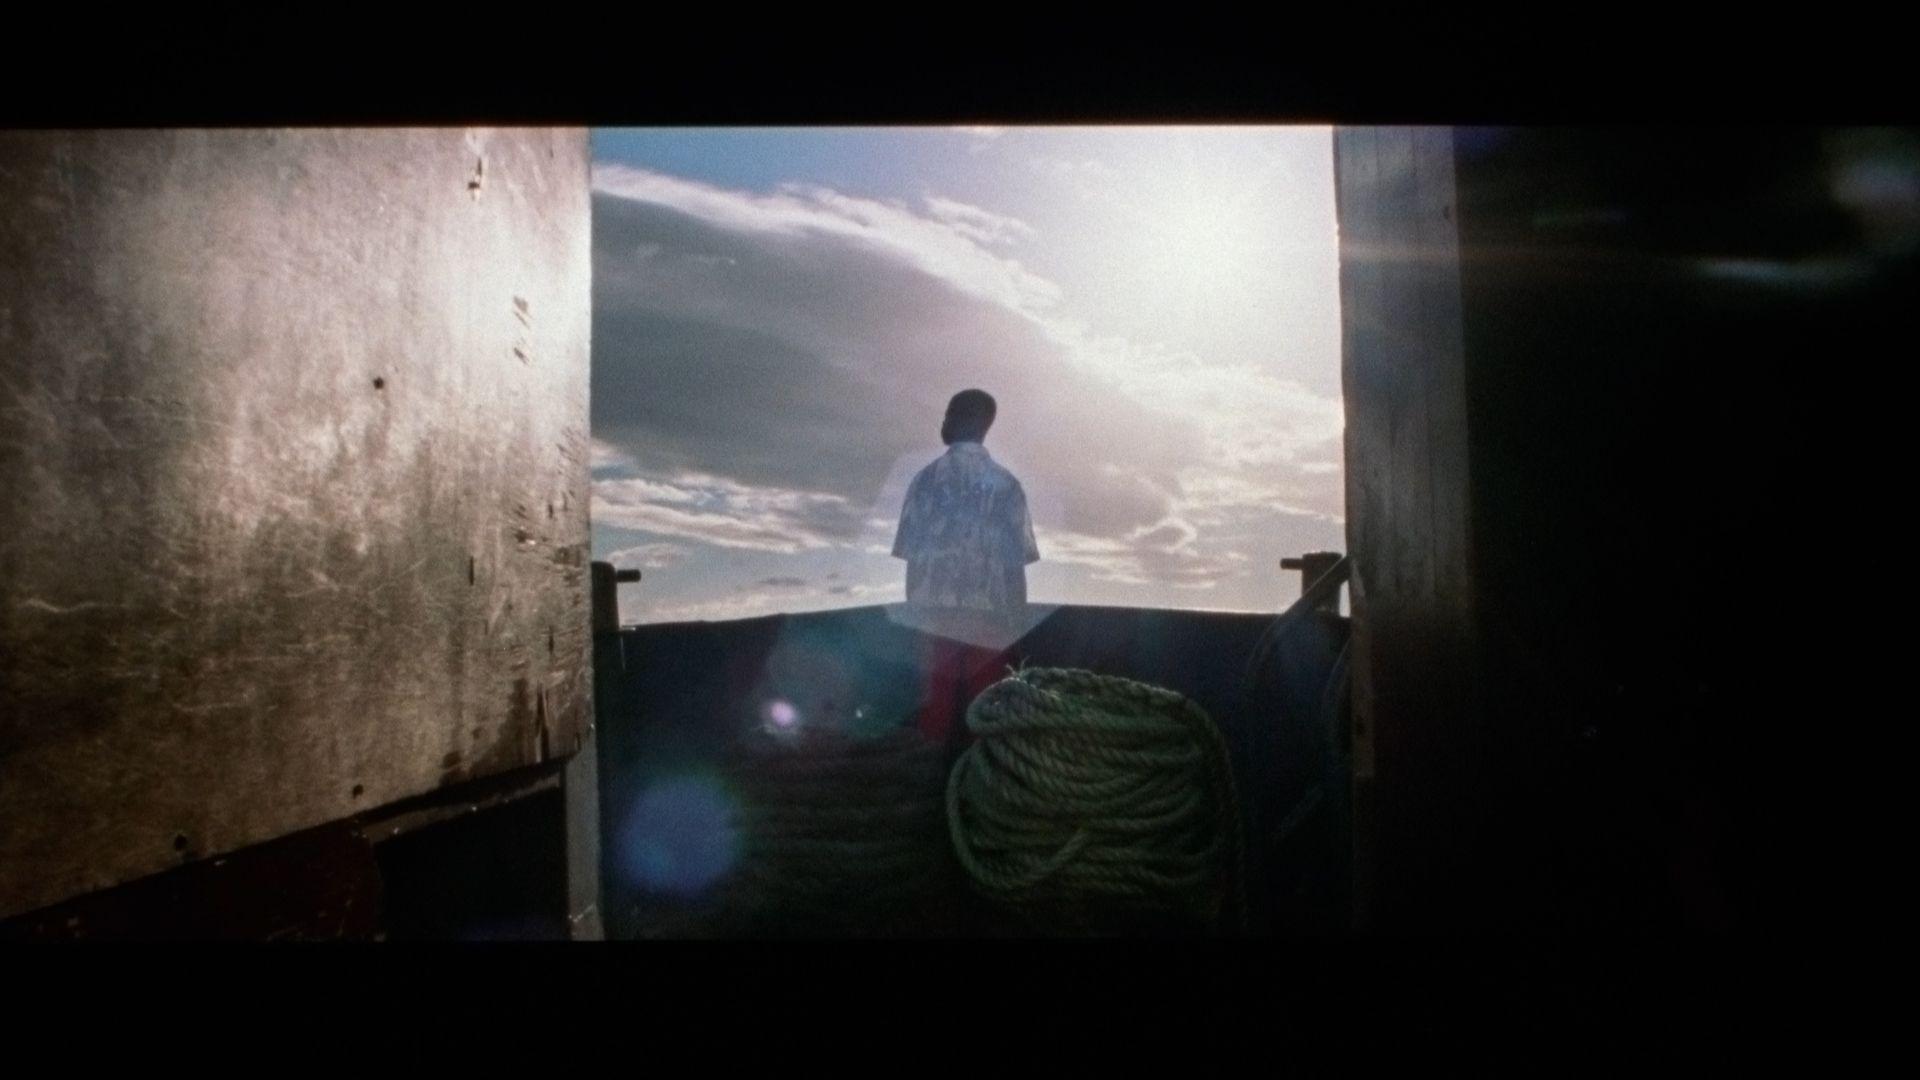 singer Karim Ouellet on a boat for his music video of La Mer A Boire filmed by Les Gamins